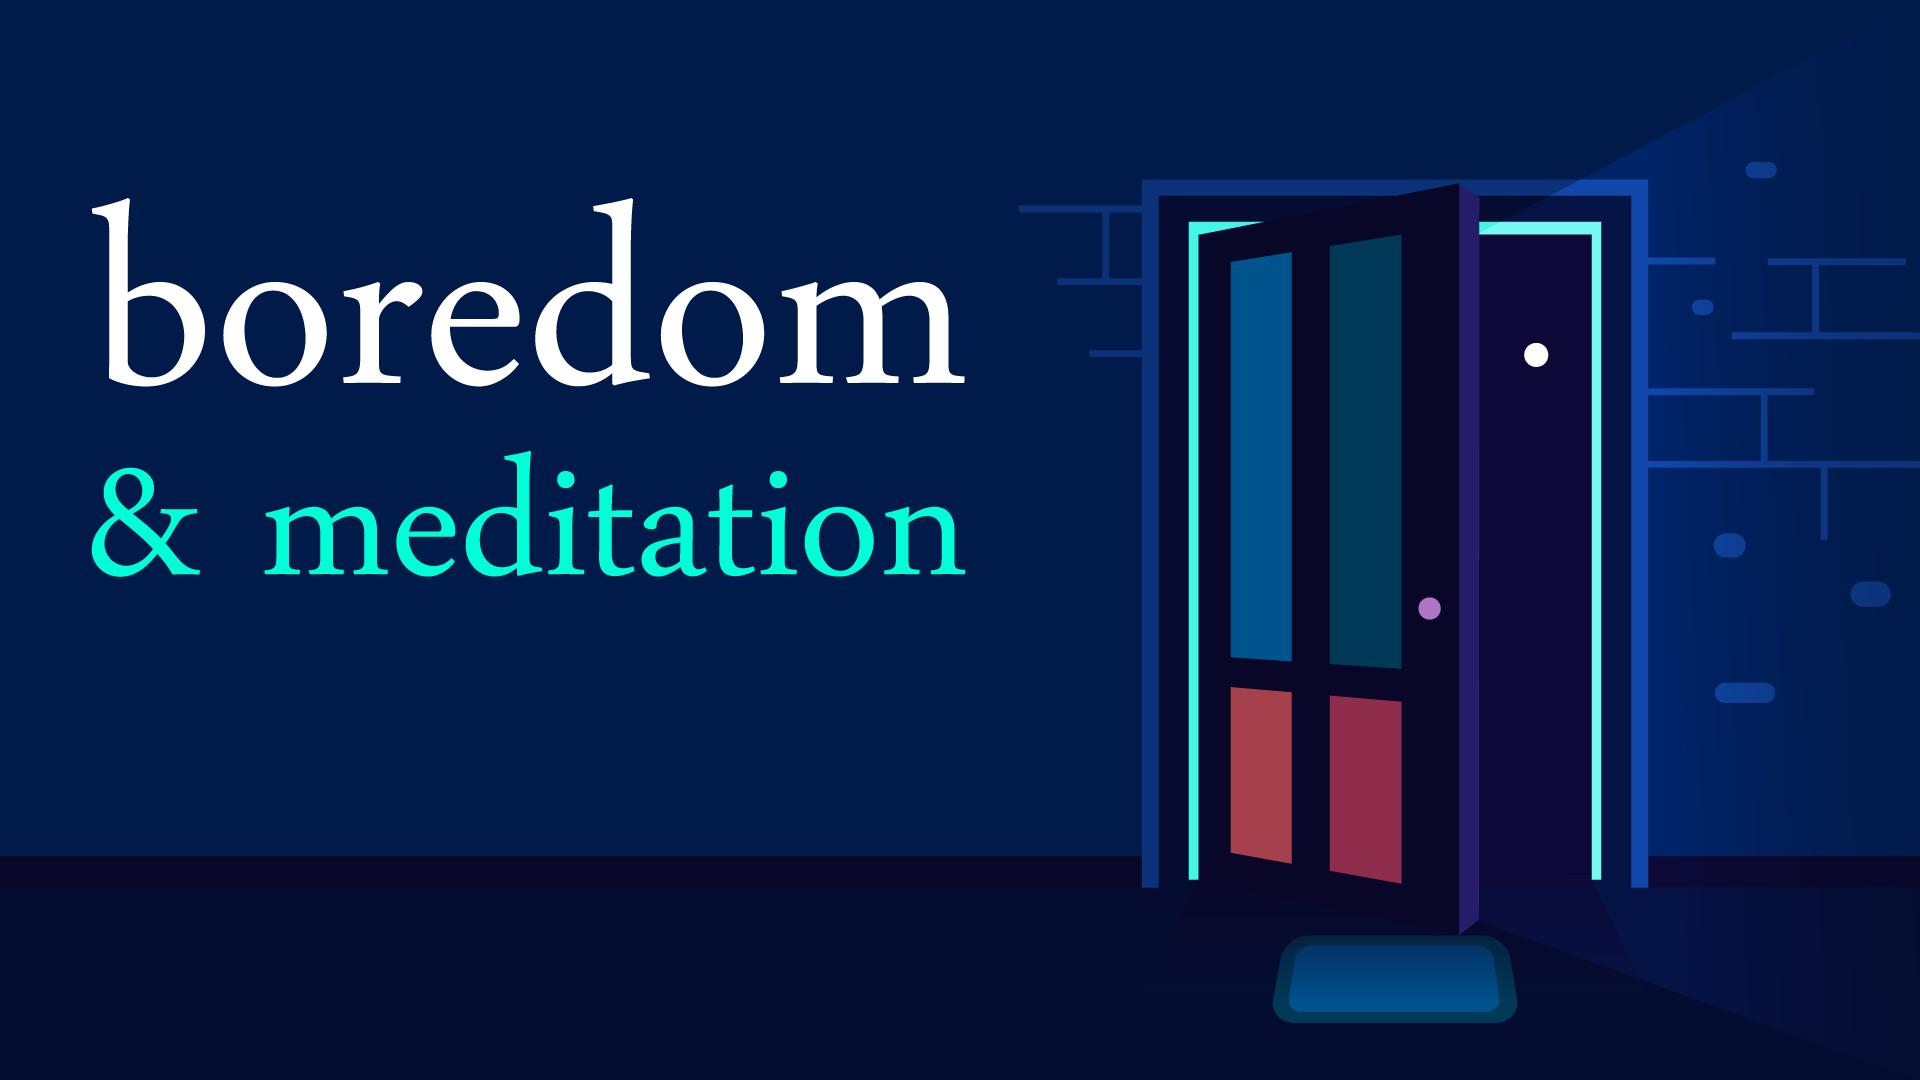 boredom & meditation